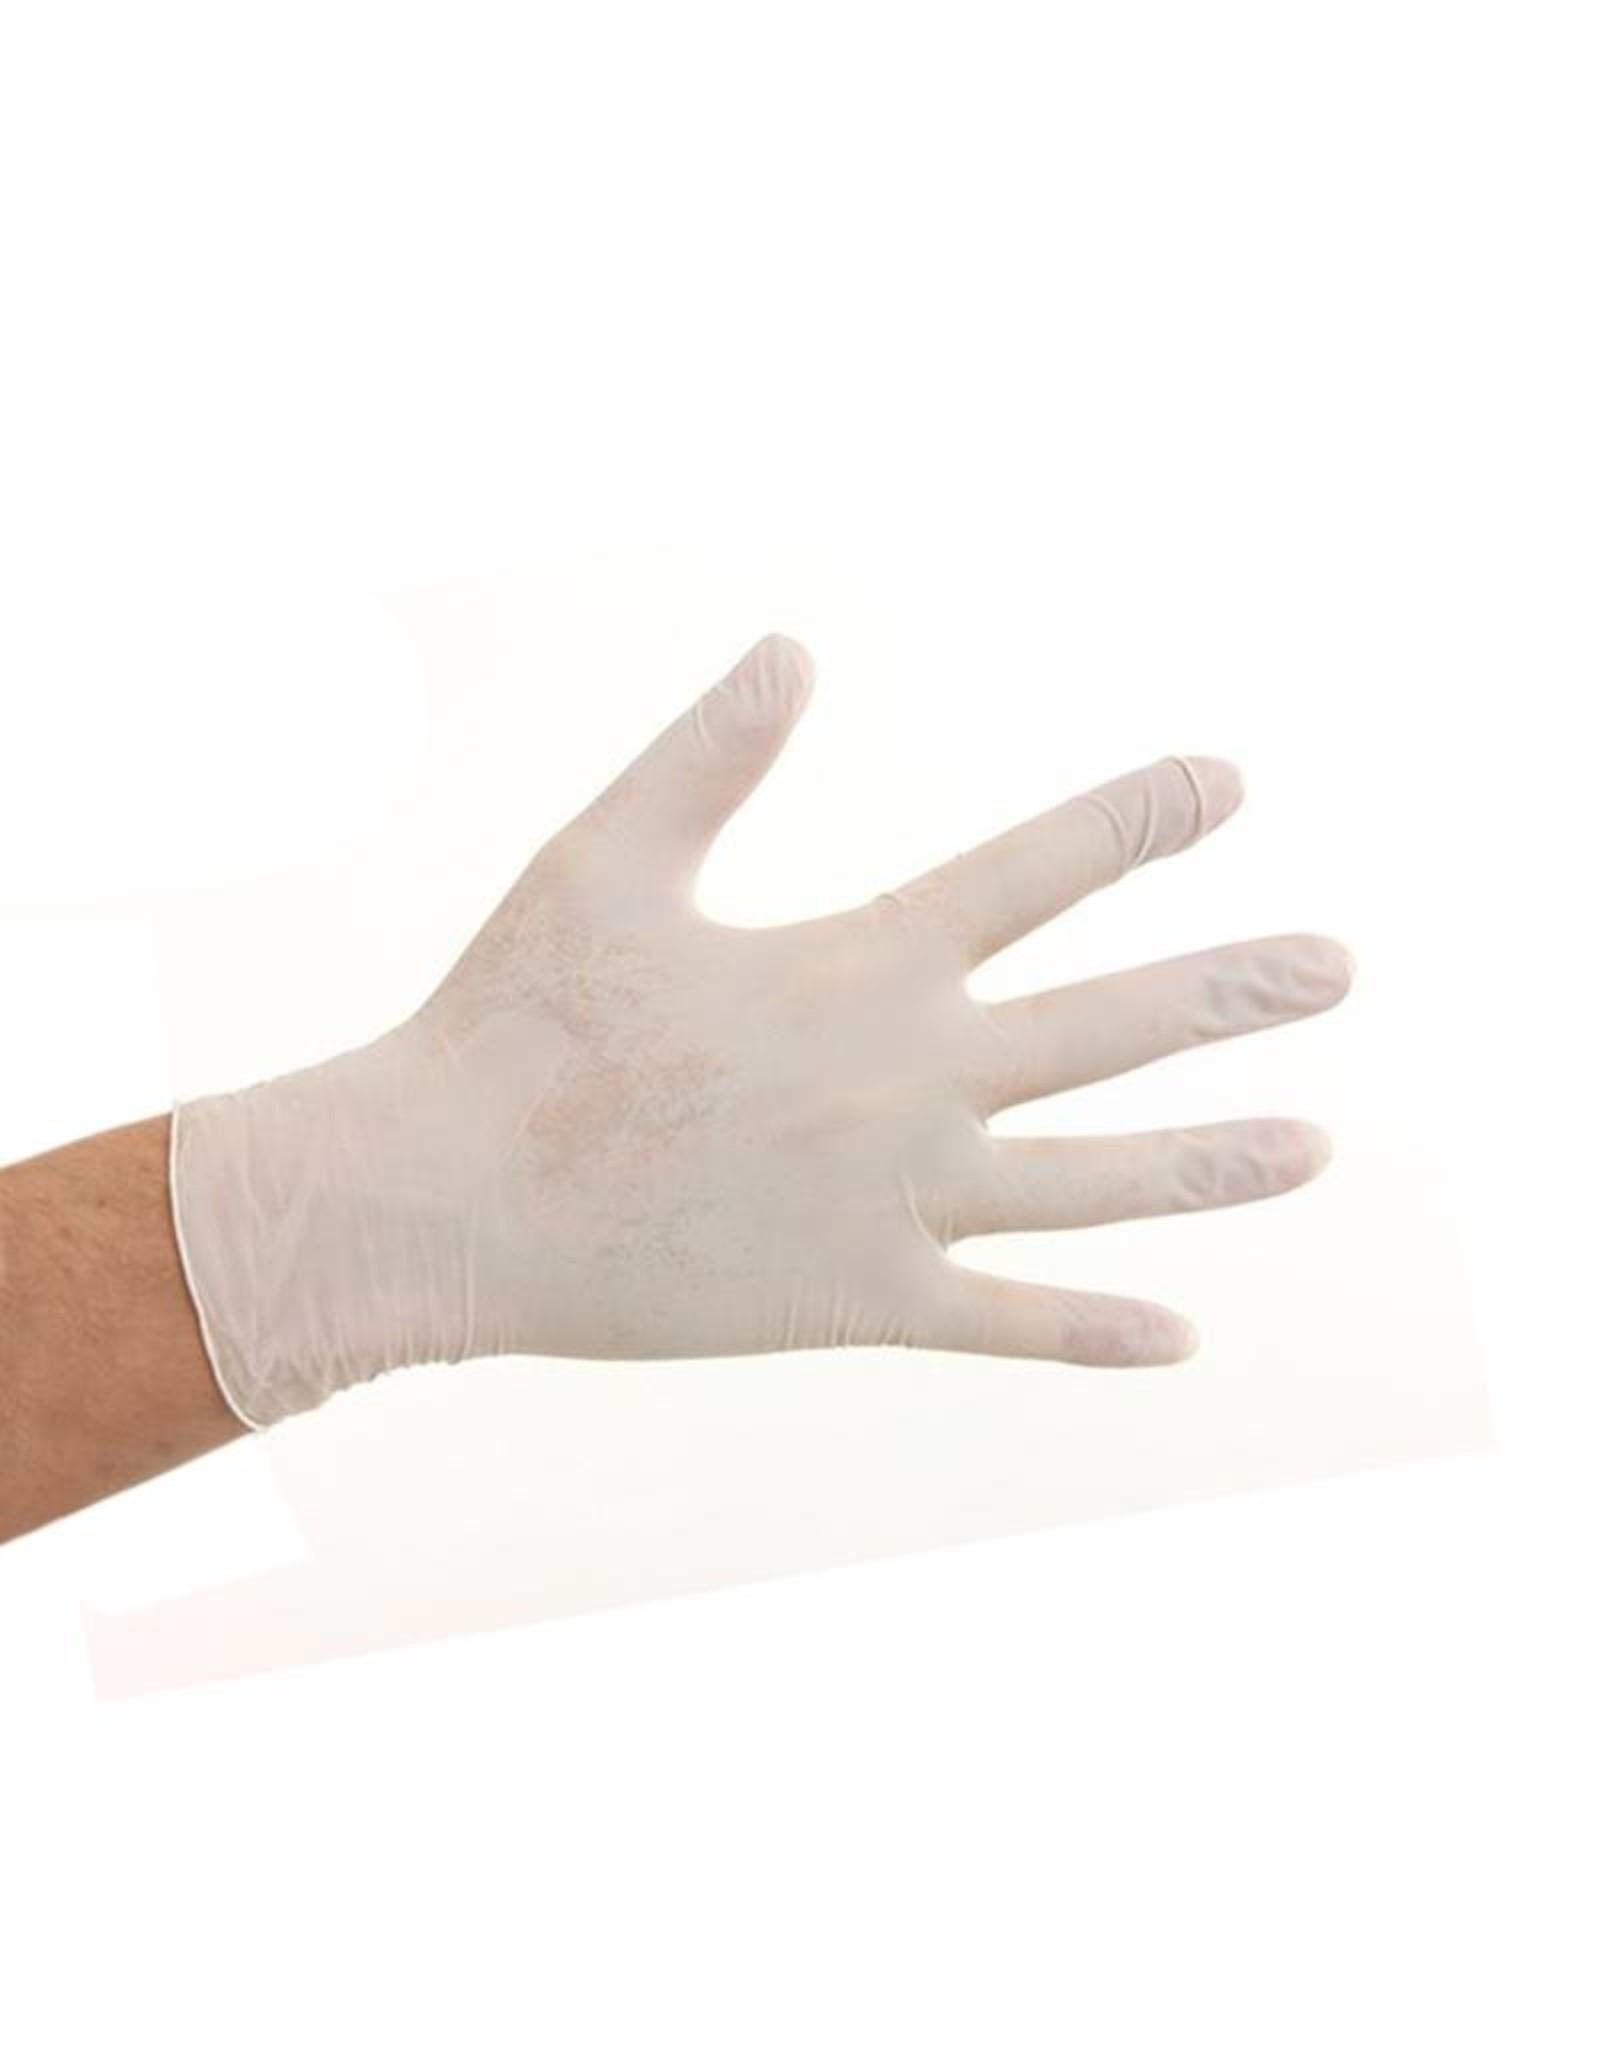 CMT CMT soft nitril handschoenen poedervrij M wit